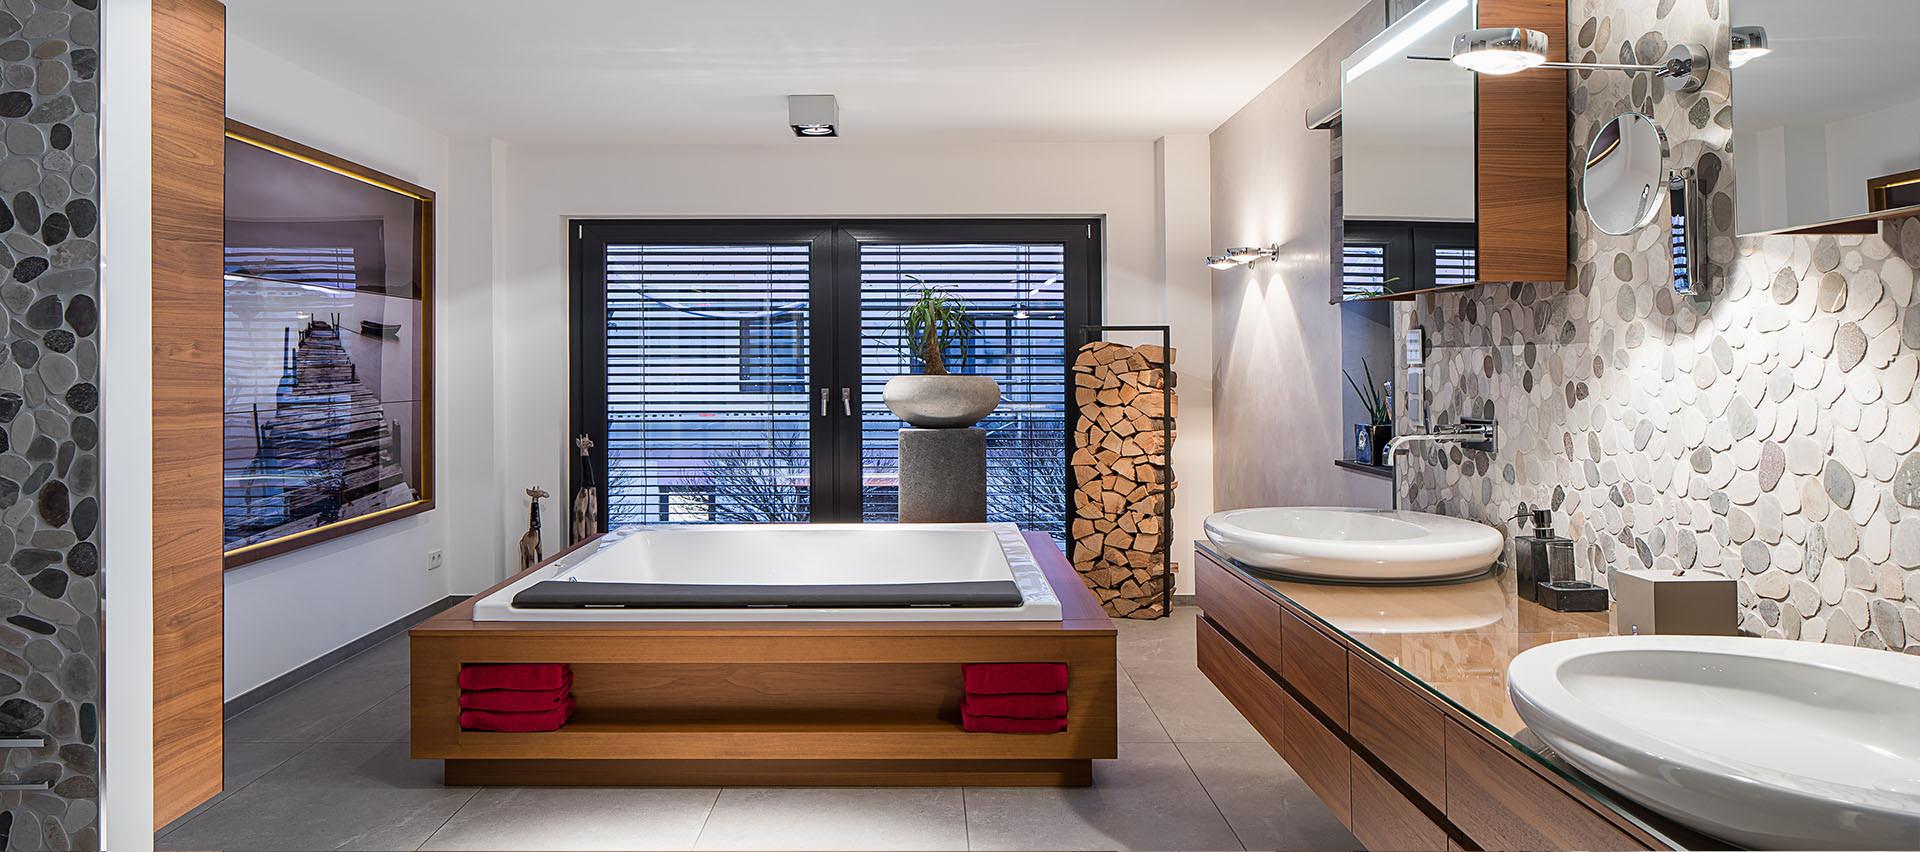 stadtvilla k ln widdersdorf naturstein pabel. Black Bedroom Furniture Sets. Home Design Ideas